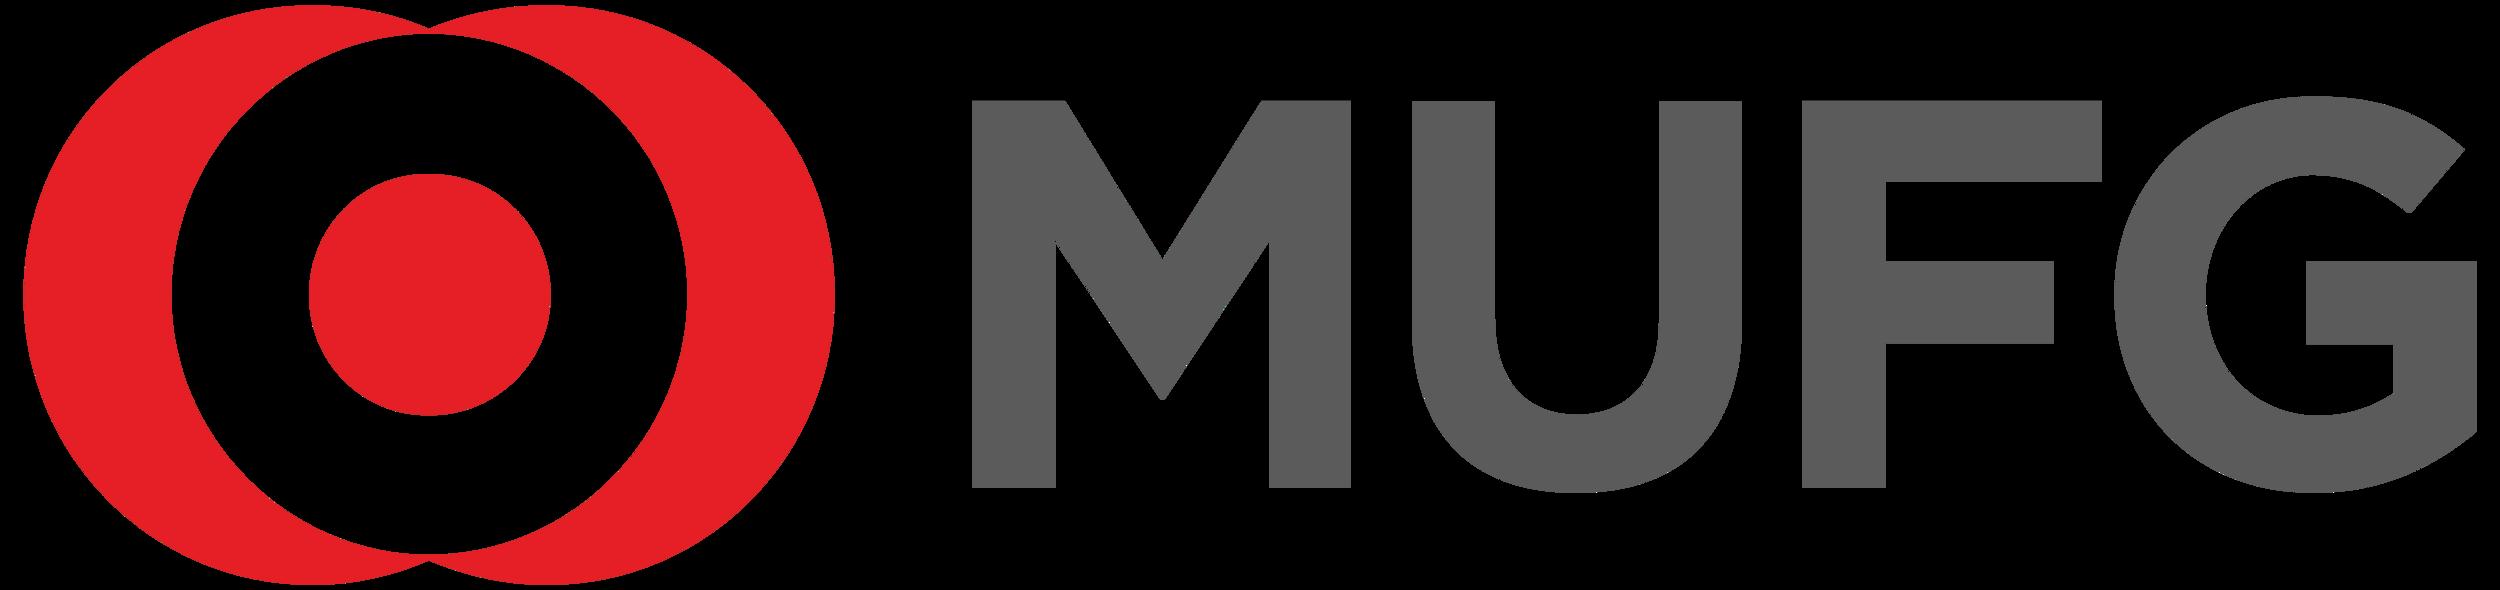 mufg-png-mufg-mitsubishi-ufj-financial-group-5000.png